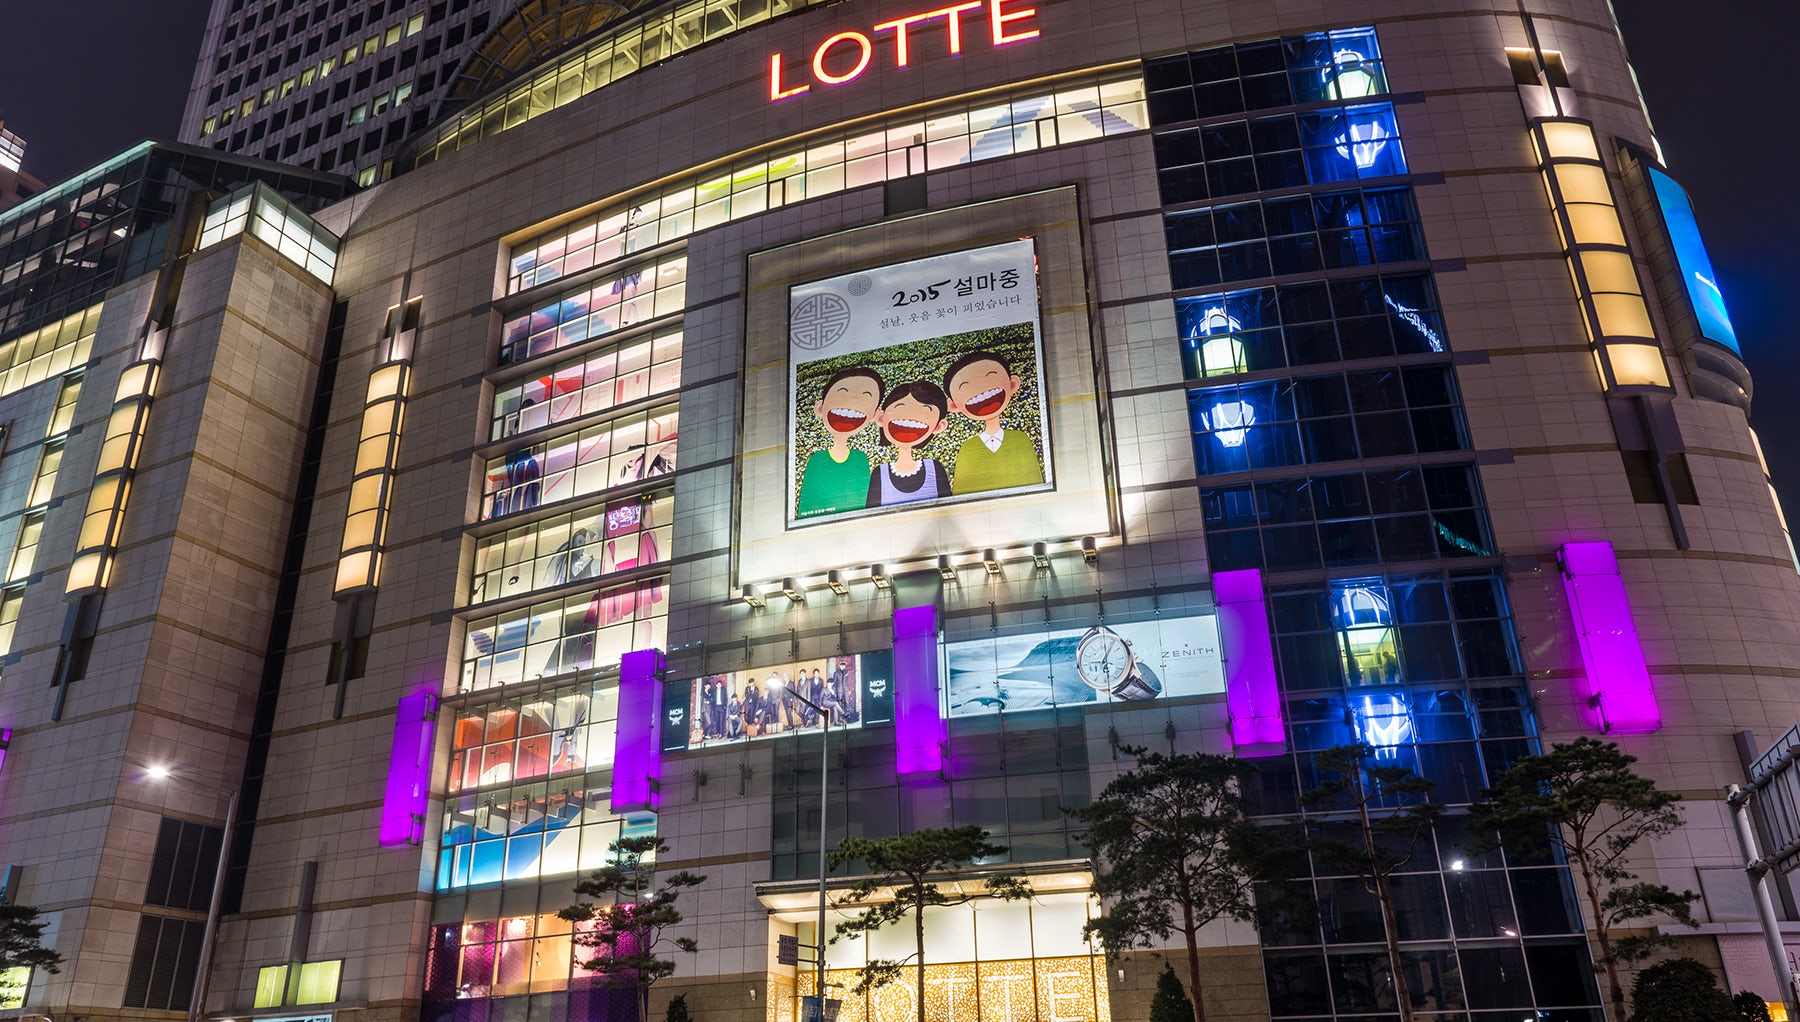 A Lotte department store | Source: Shutterstock